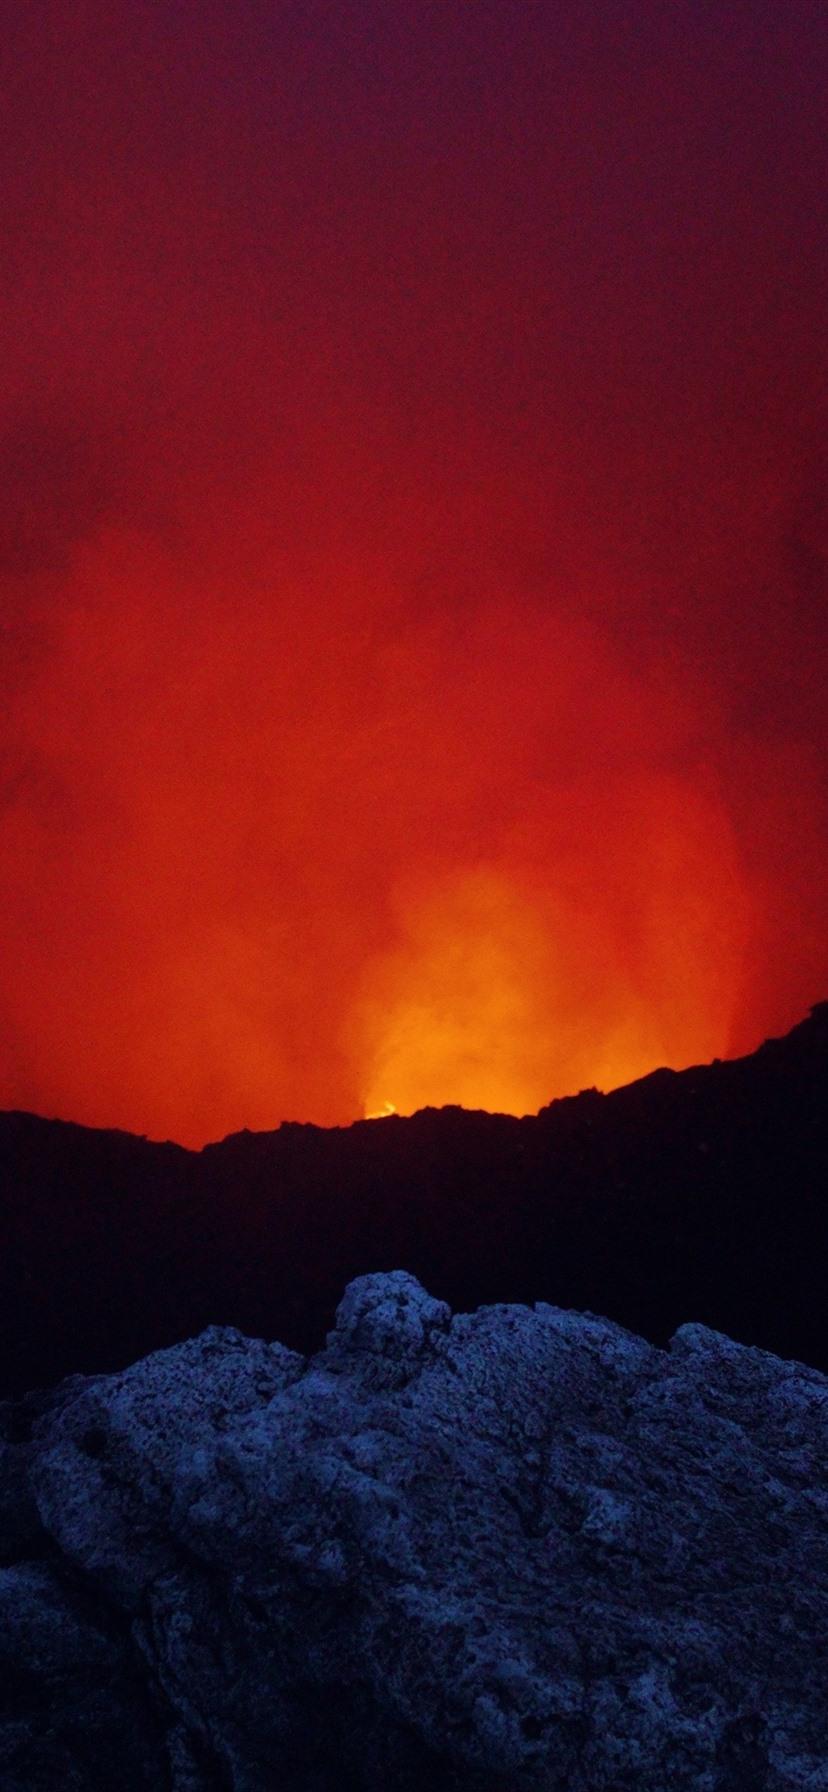 Wallpaper Nicaragua, Masaya Volcano, lava 3840x2160 UHD 4K Picture, Image